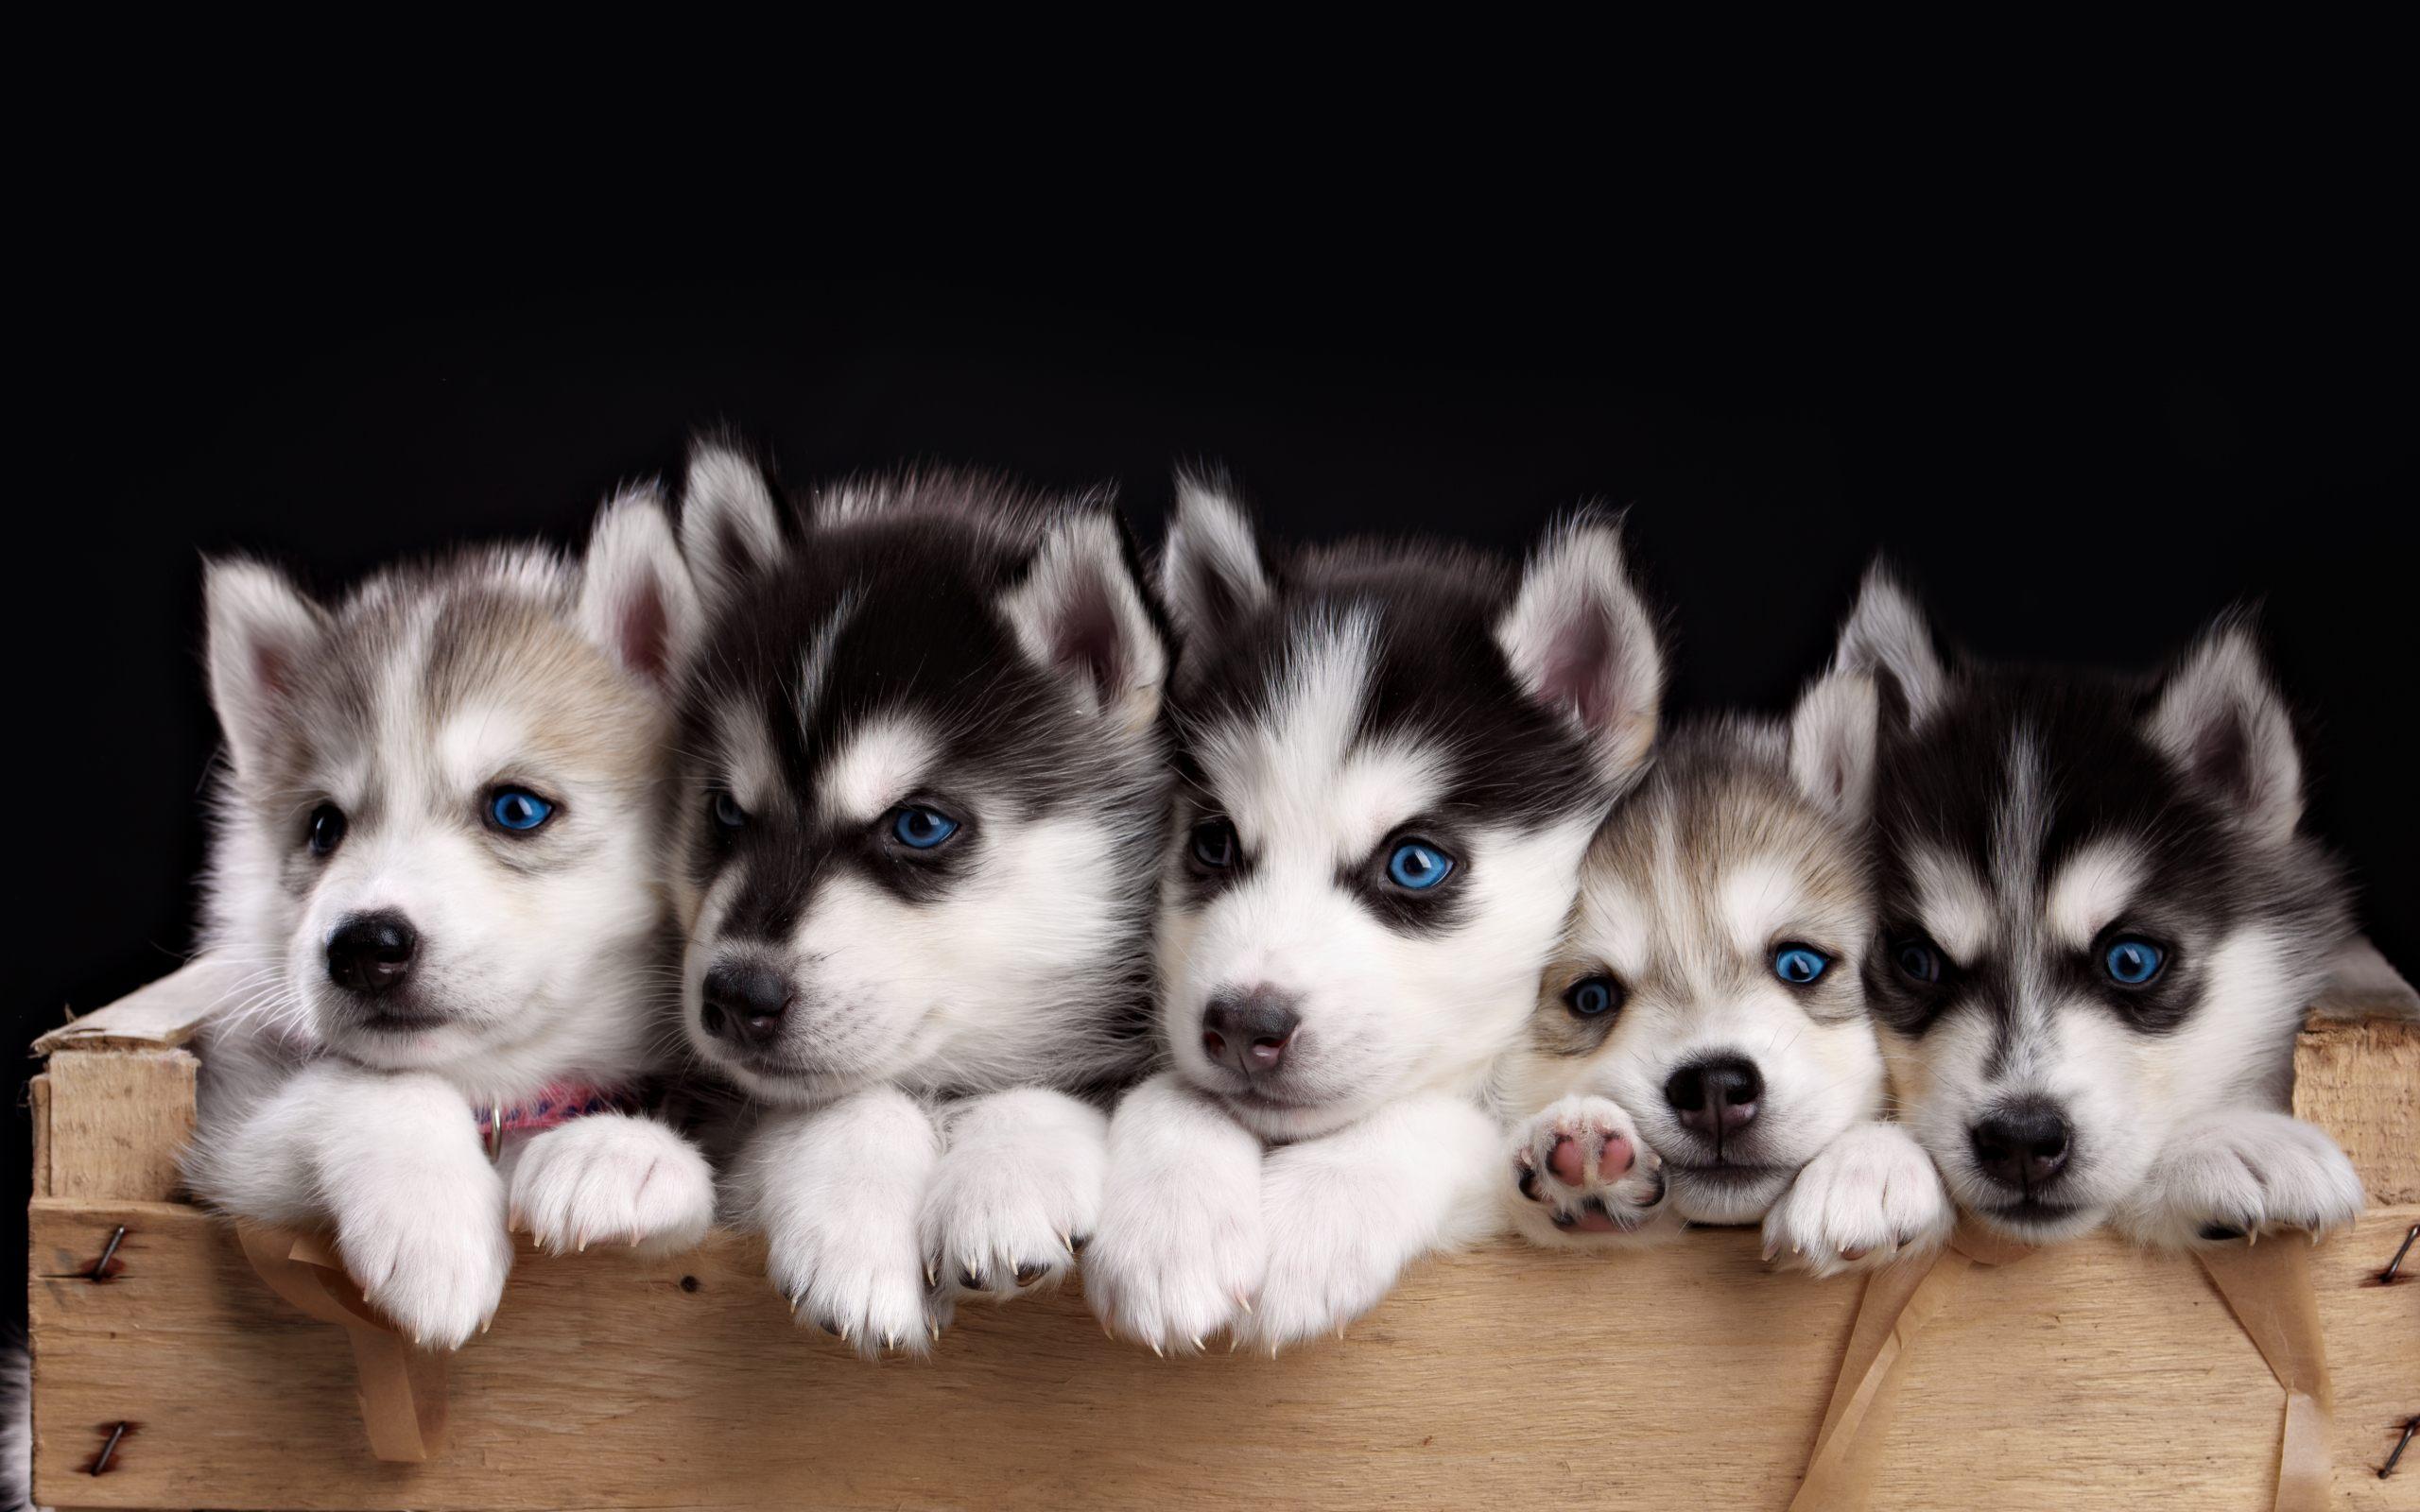 husky dog wallpaper - wallpapersafari